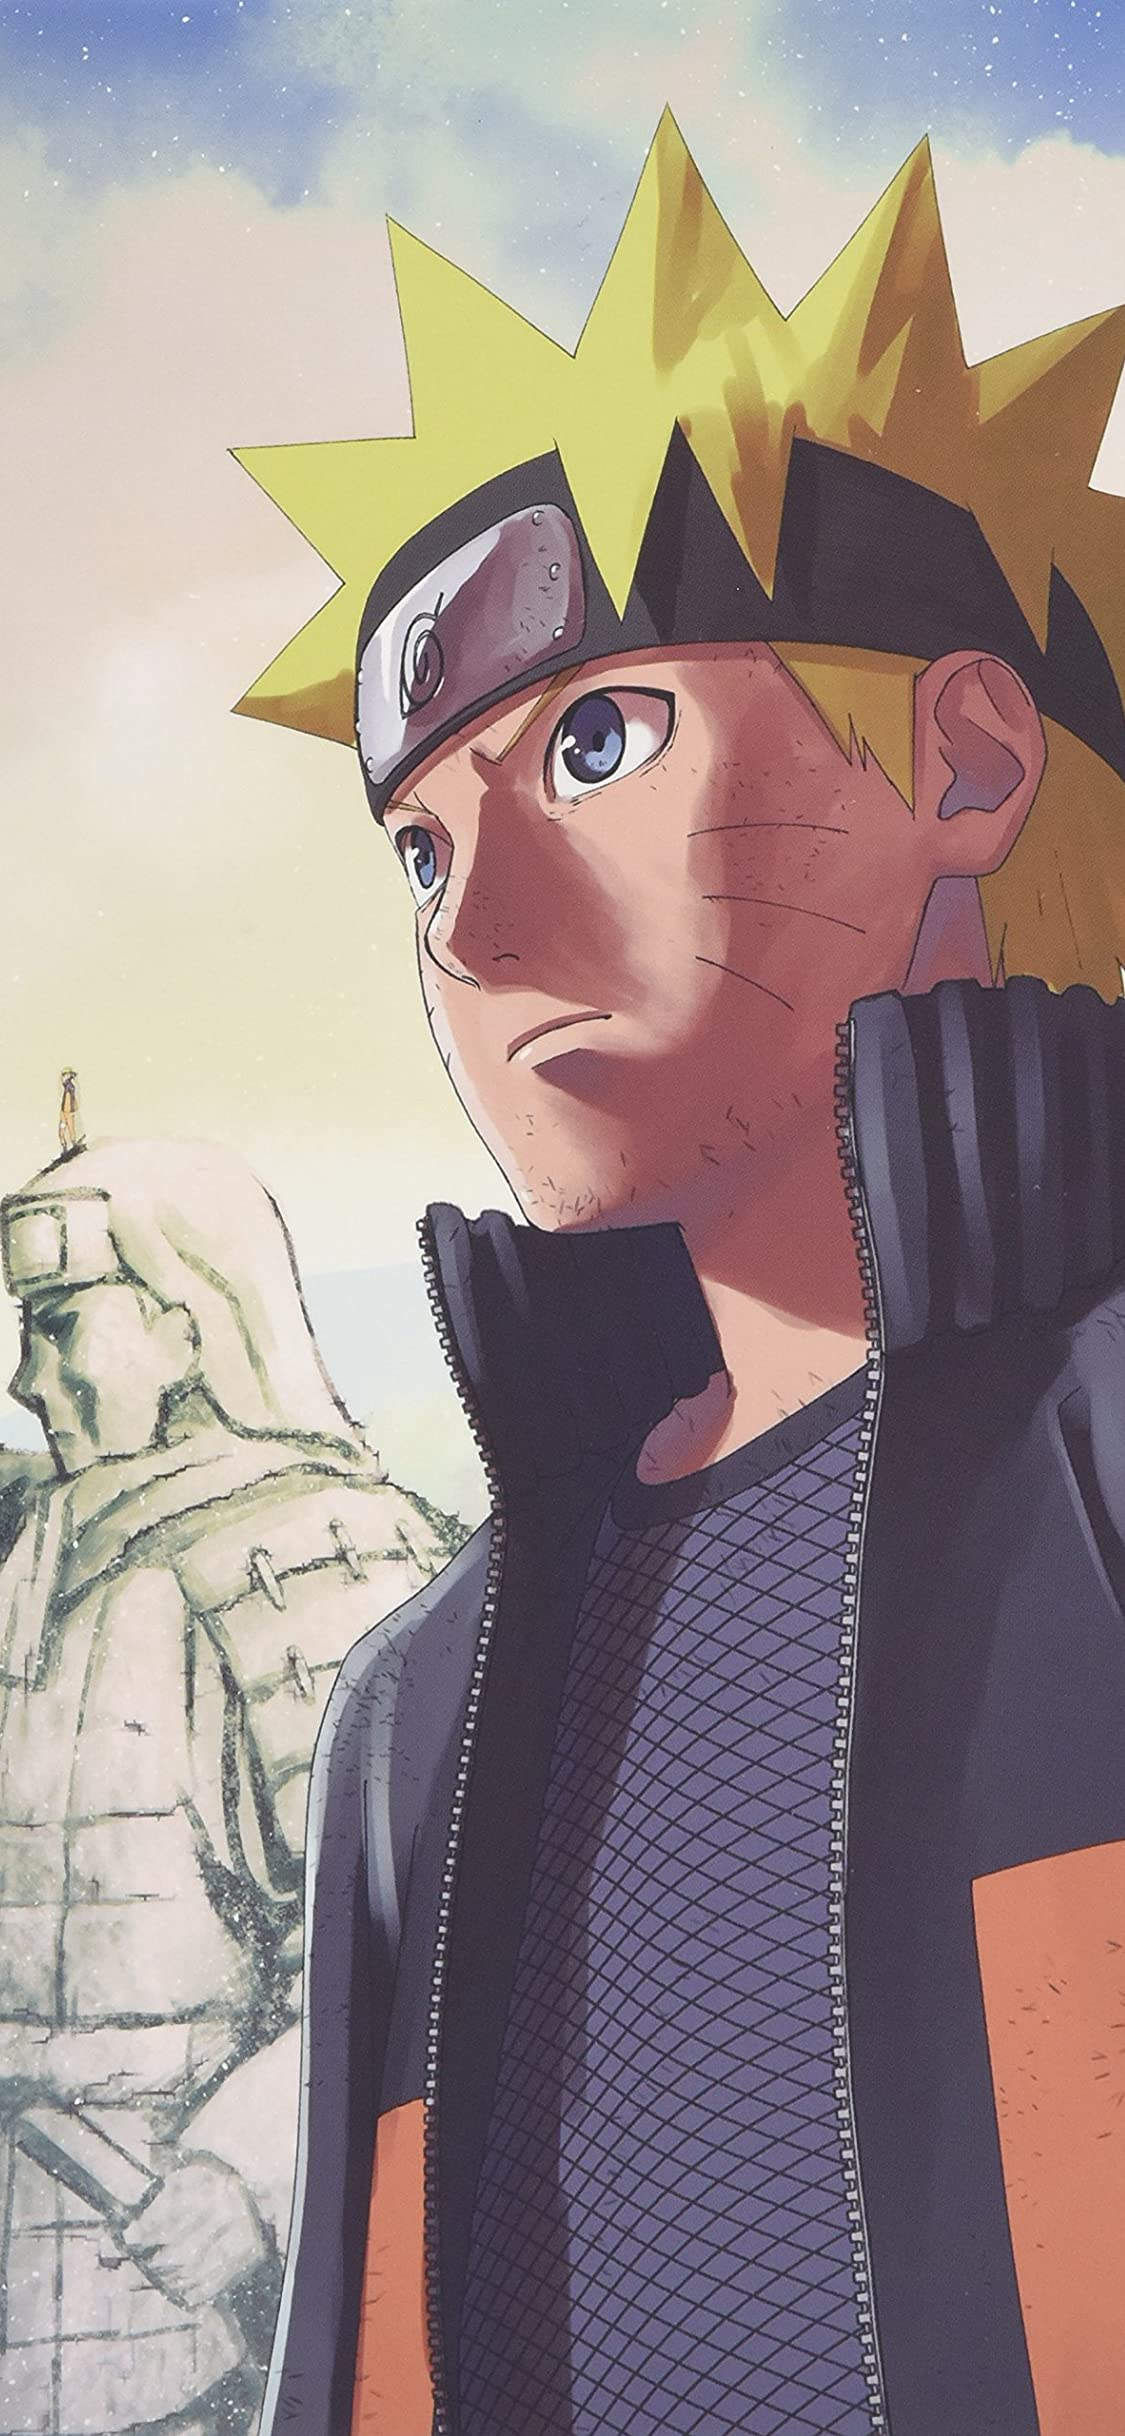 Naruto ナルト うずまきナルト Iphone X 壁紙 1125x2436 画像69423 スマポ